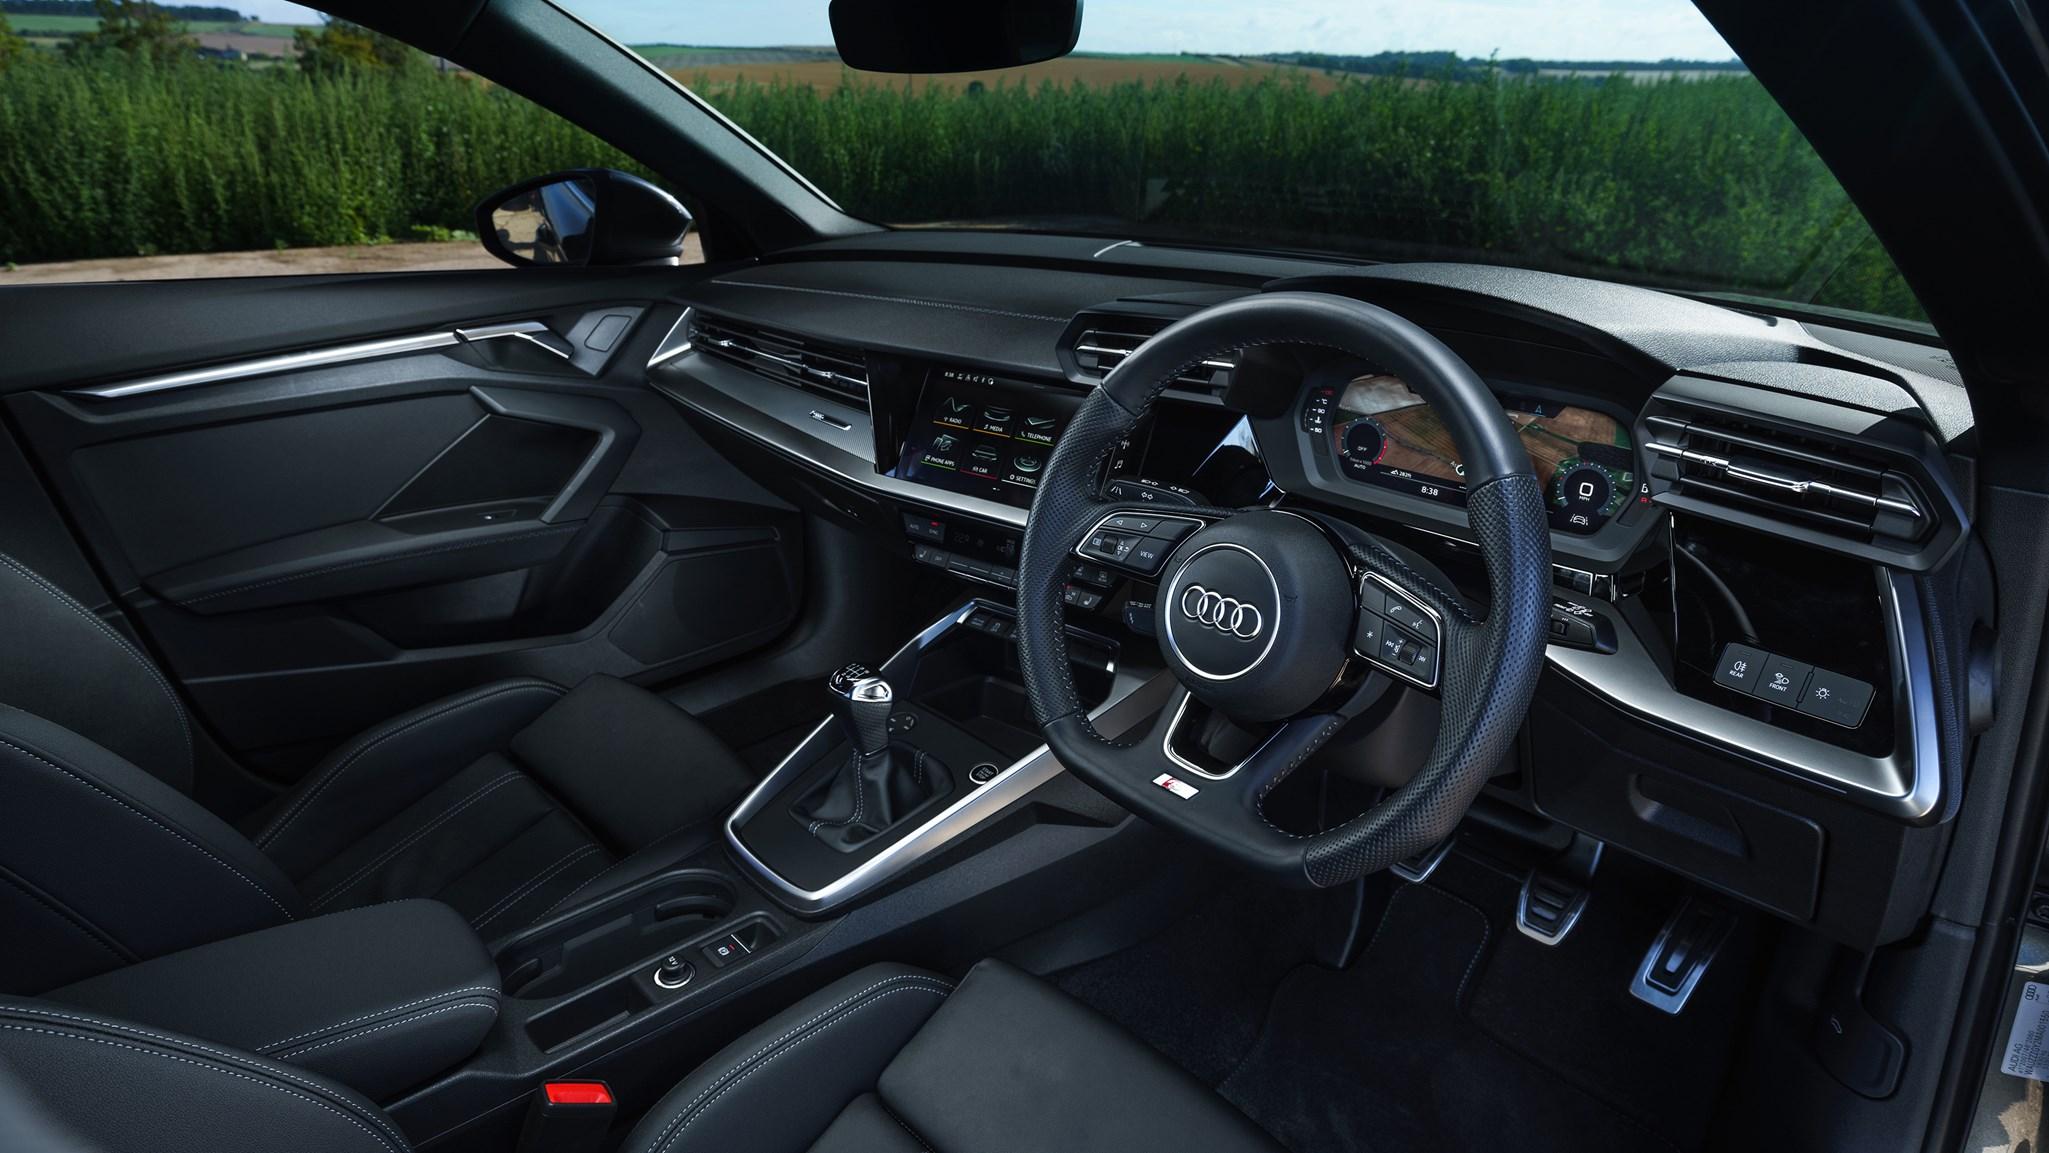 Audi A3 Sportback (2020) interior view